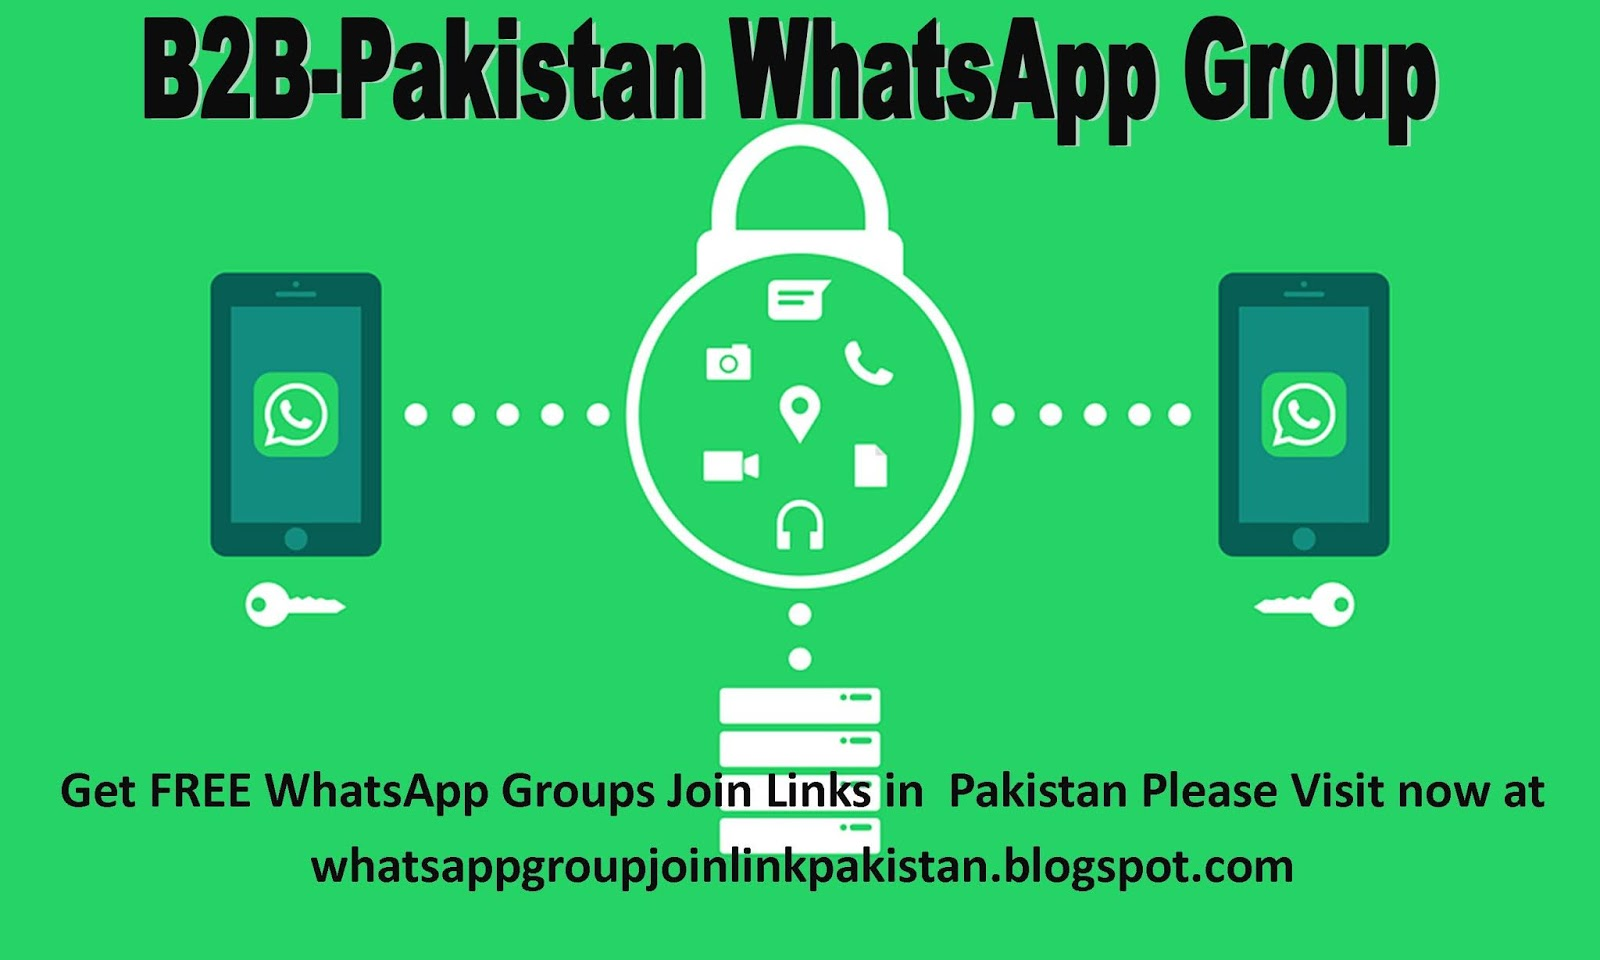 B2B-Pakistan WhatsApp Group to Join FREE